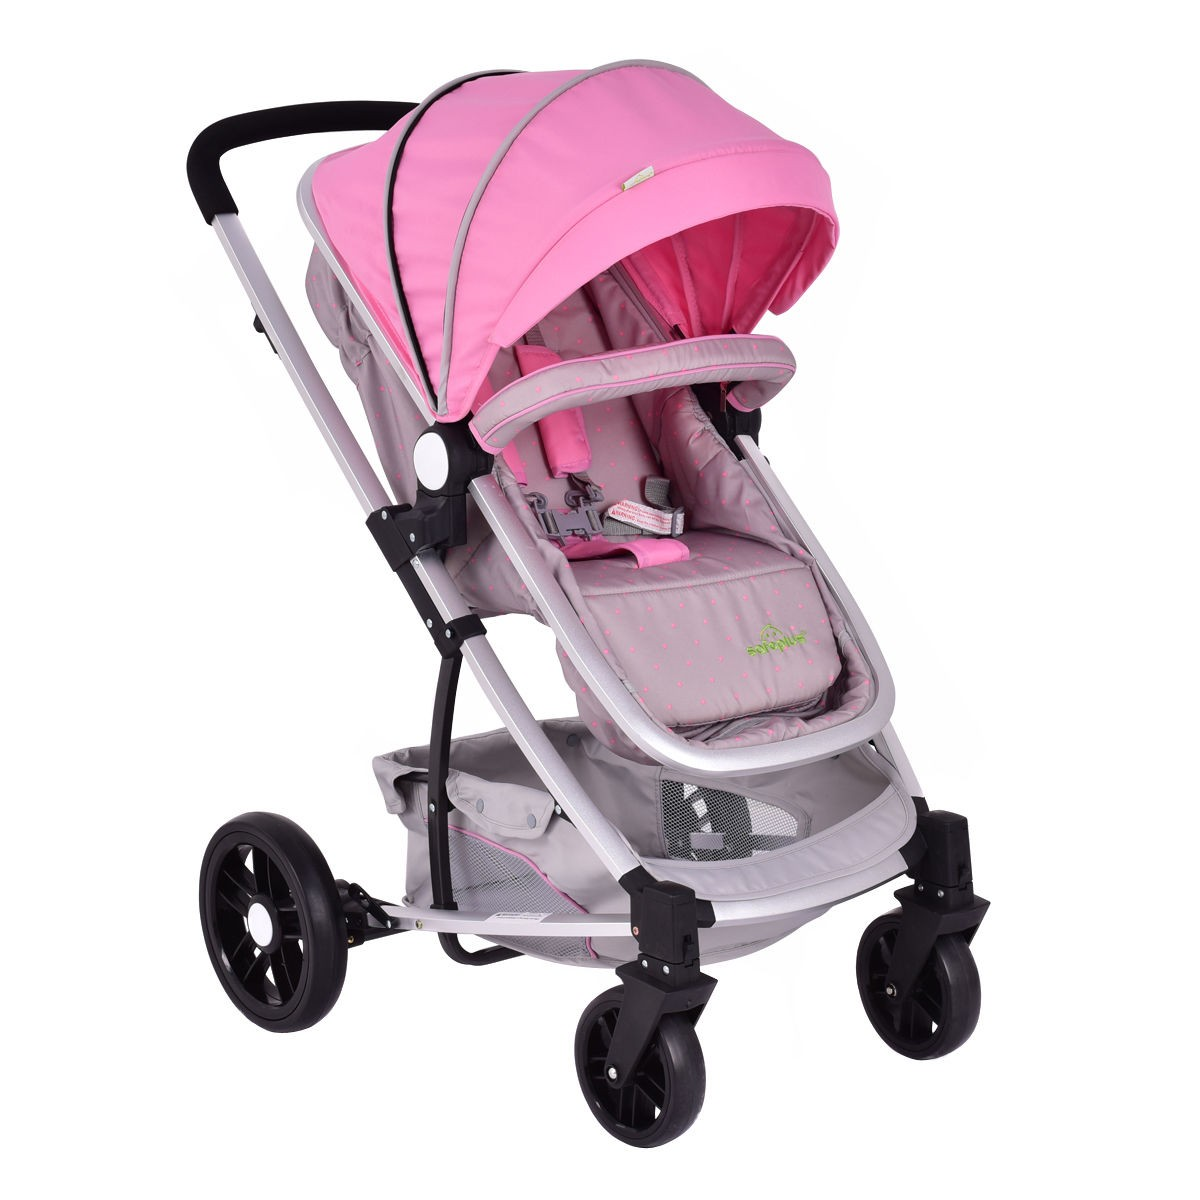 2 in1 foldable baby stroller kids travel newborn infant buggy pushchair us stock. Black Bedroom Furniture Sets. Home Design Ideas